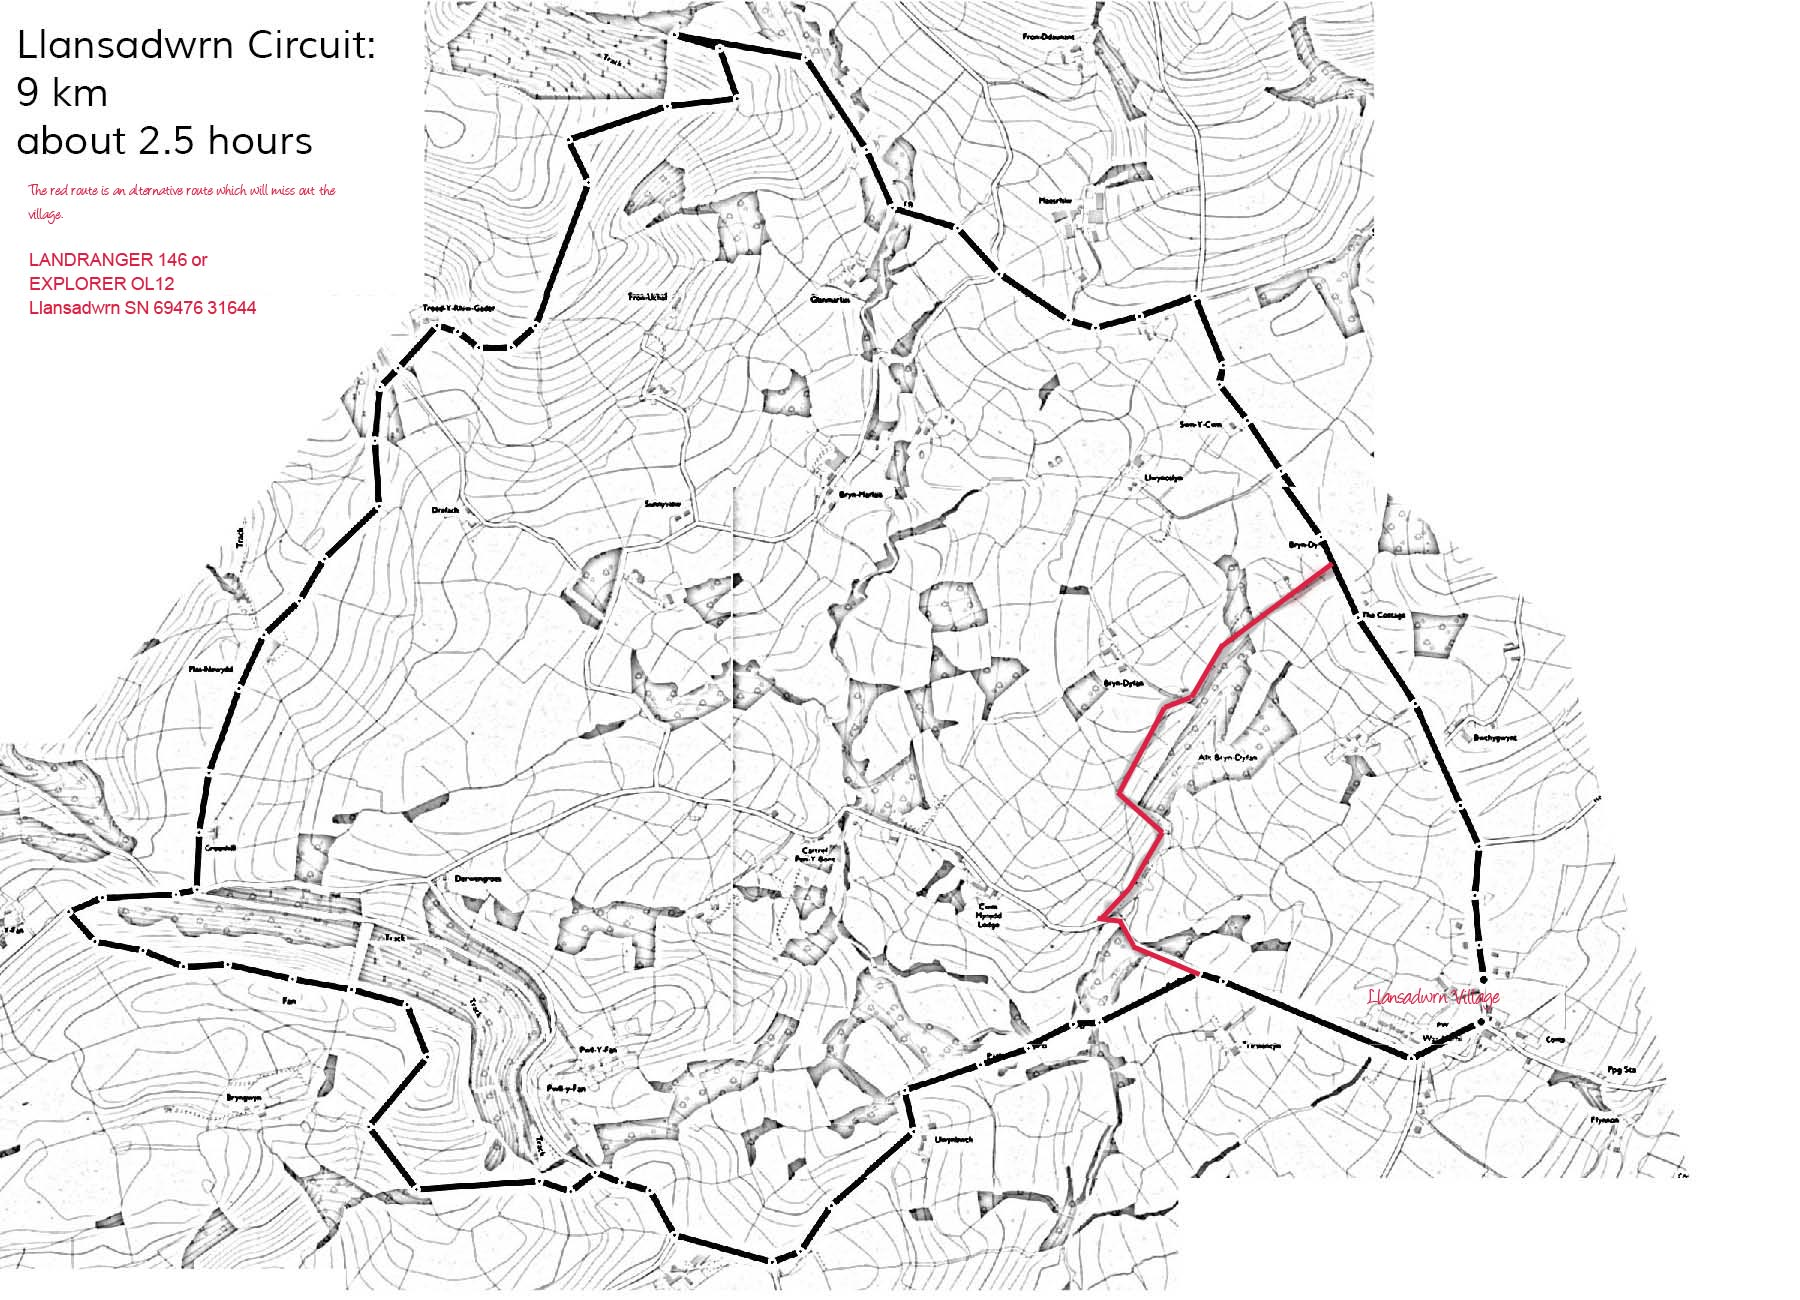 The Llansadwrn circuit